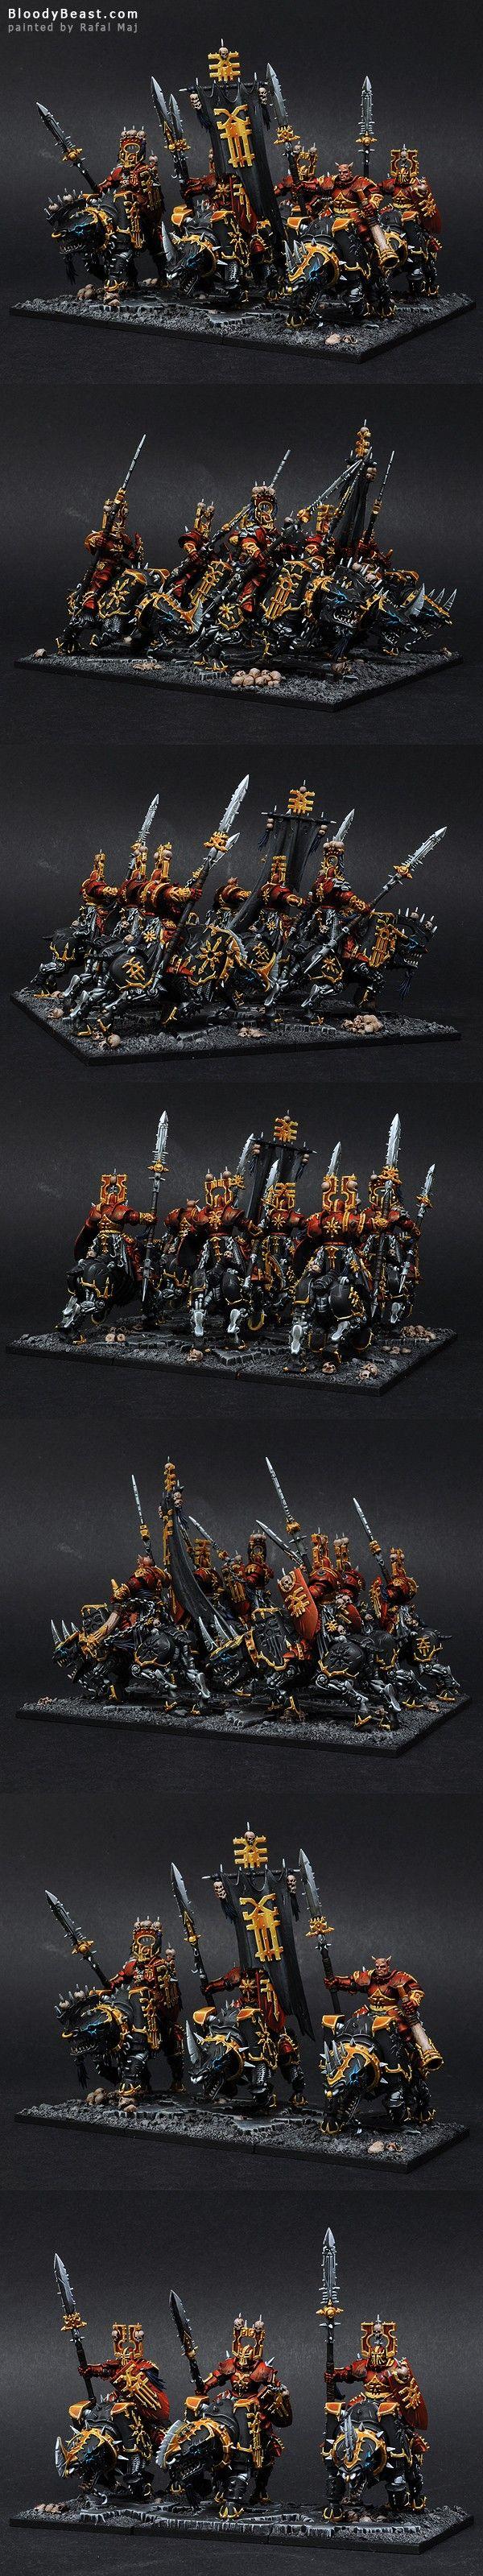 E2 Warhammer Warriros Of Chaos Skullcrushers